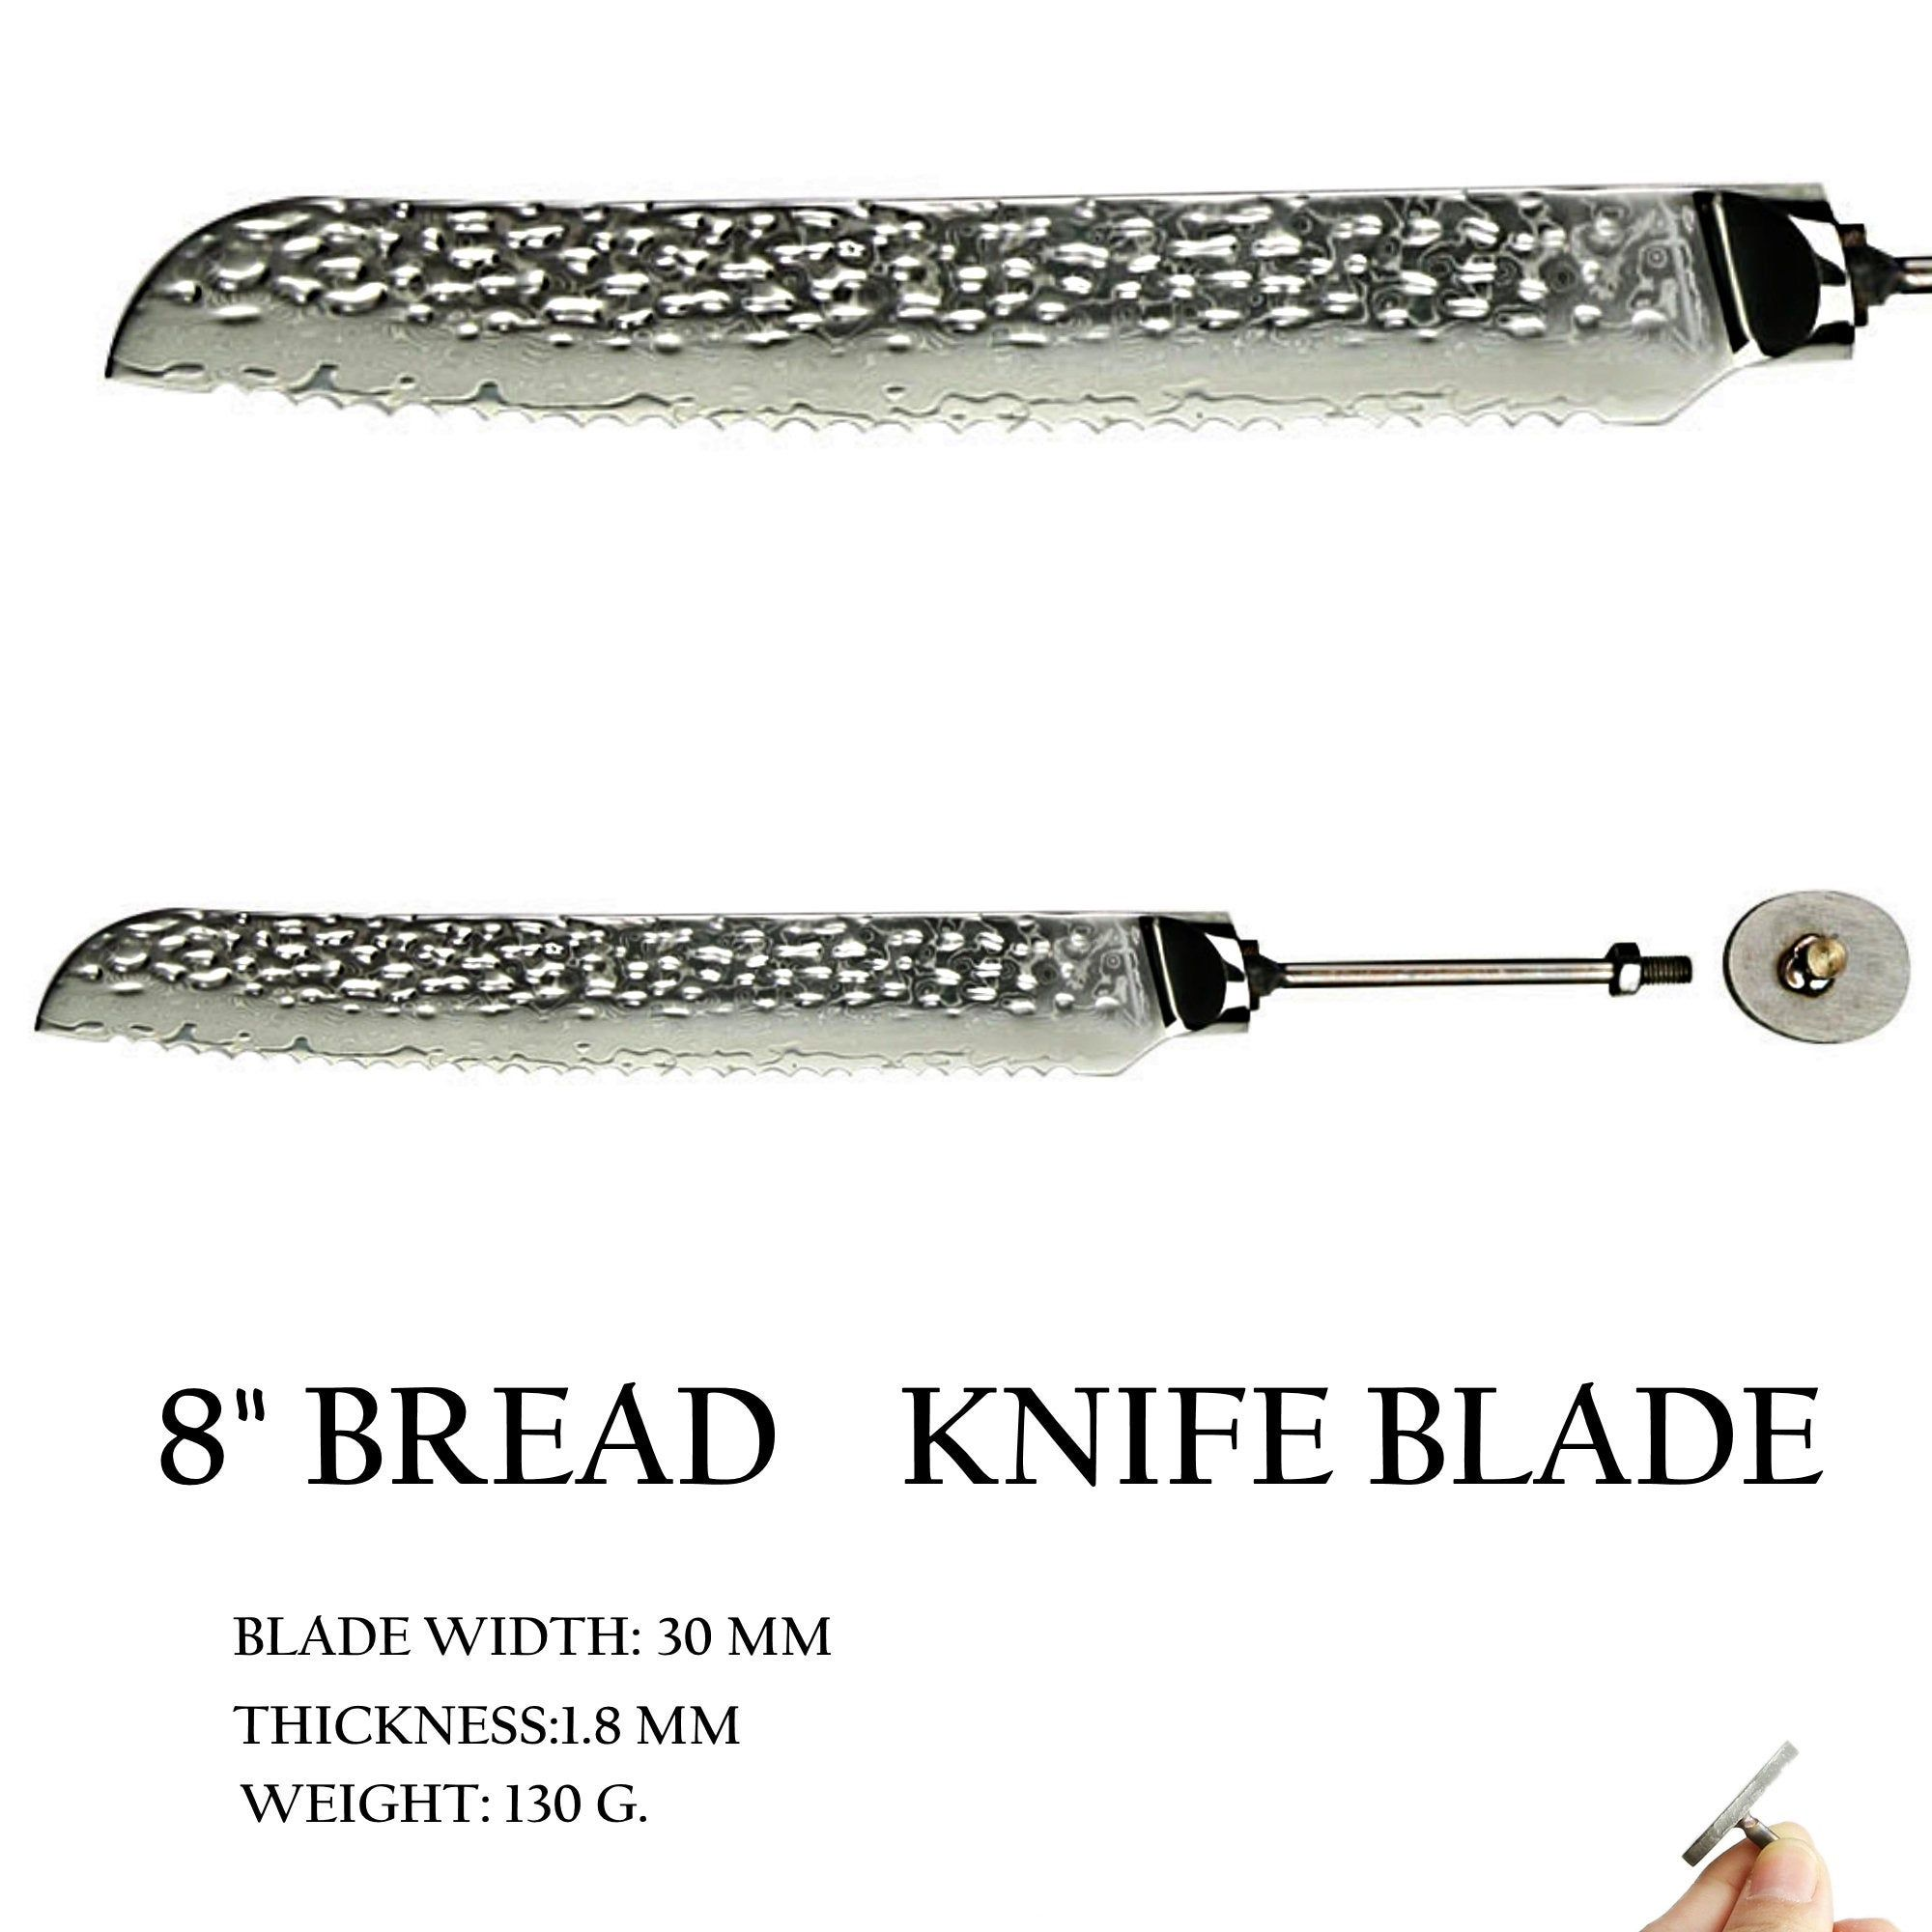 Blank Blade Diy Chef Knife Knife Making Kitchen Knife 8 Inch Etsy Chef Knife Damascus Steel Knife